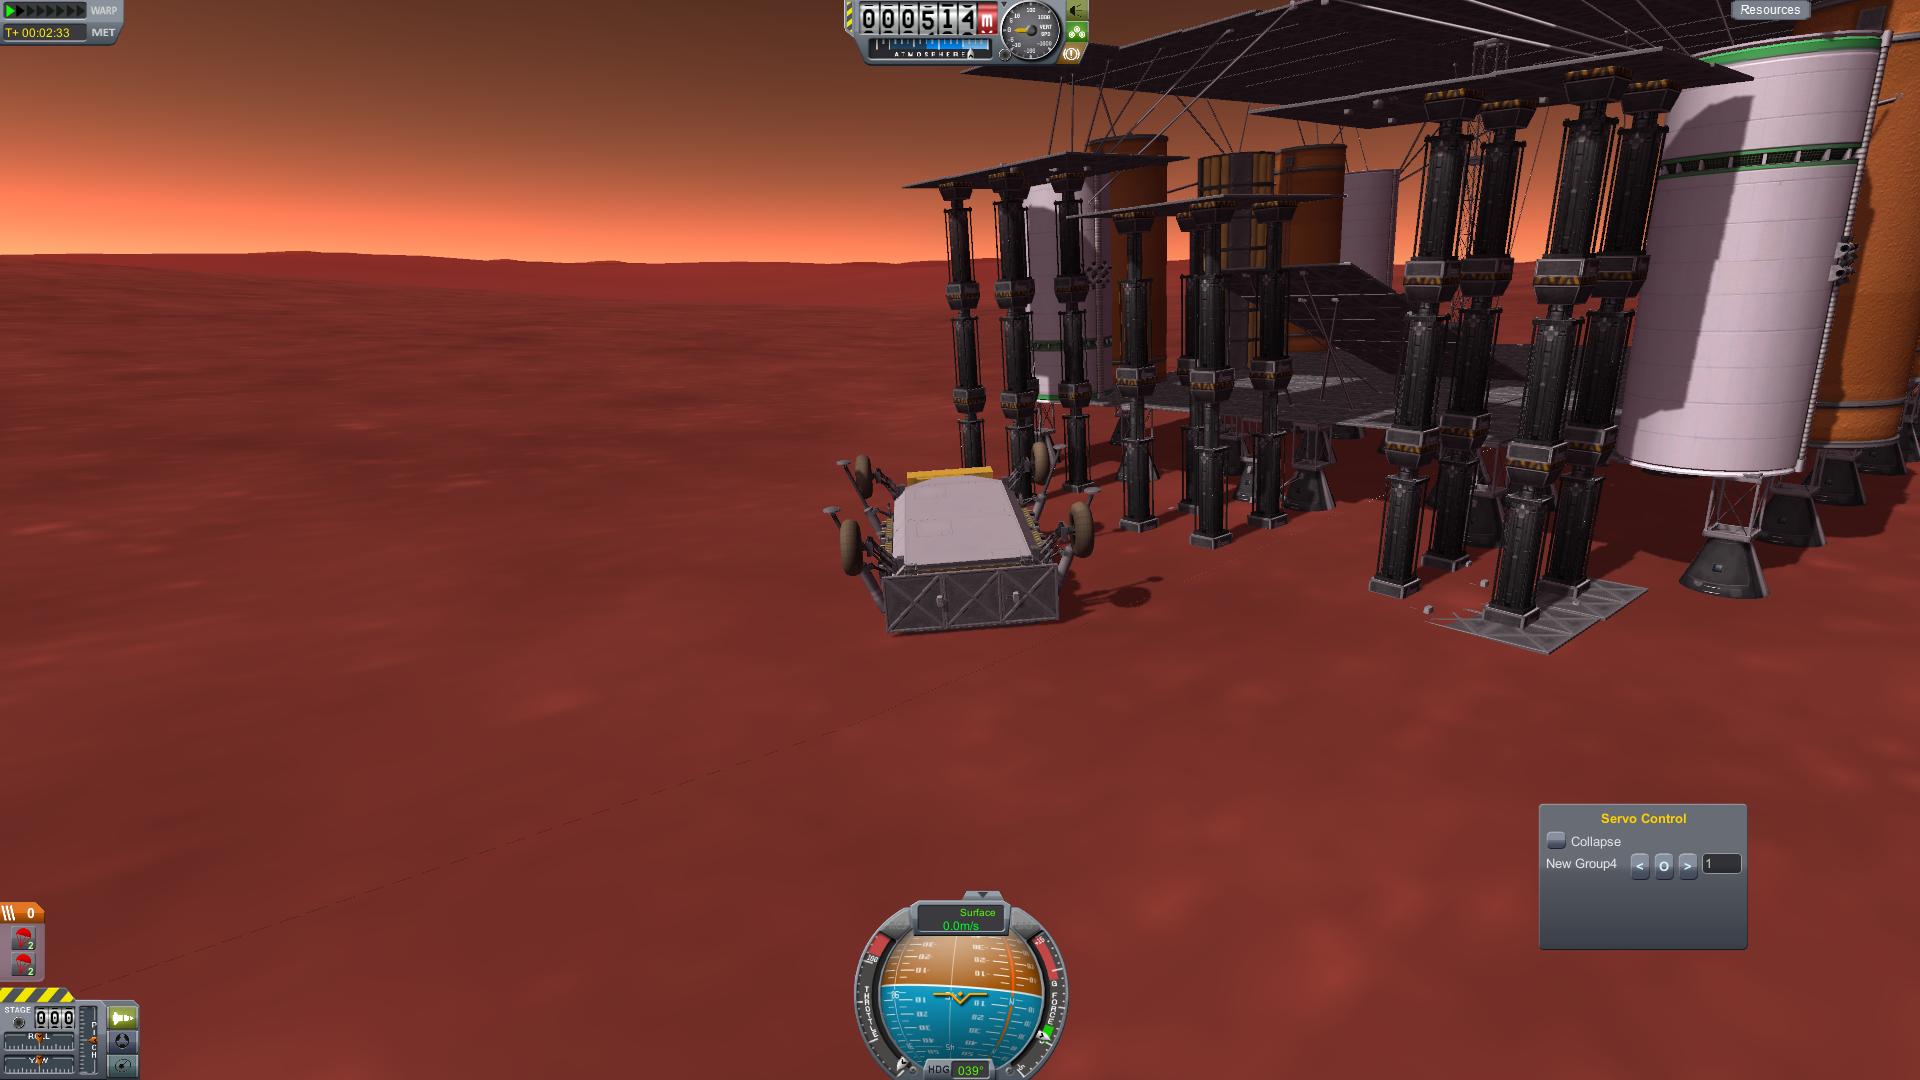 kerbal space program duna base - photo #48